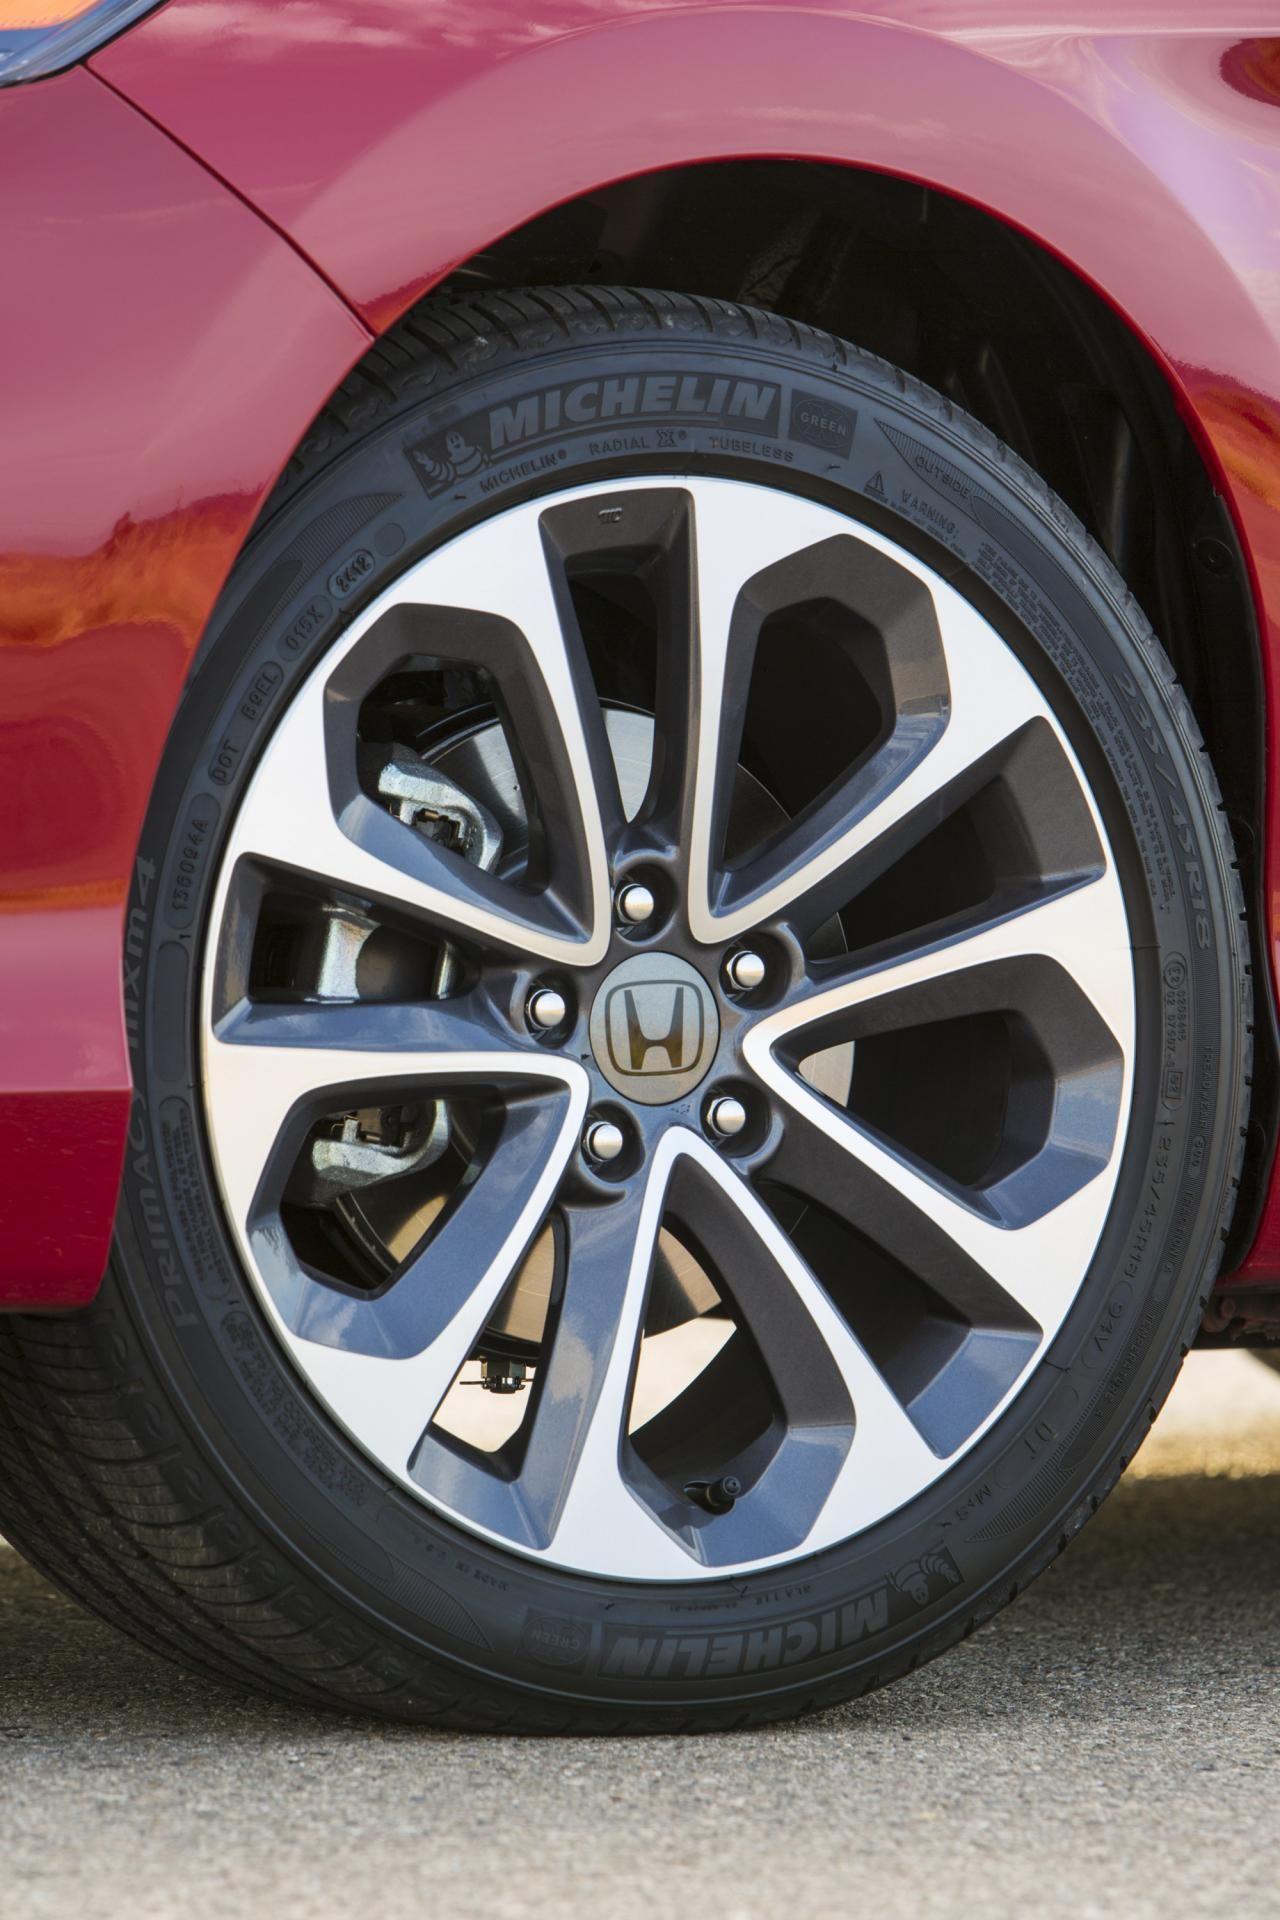 2013 Honda Civic Rims : honda, civic, Фото, Honda, Accord, Coupe, Coupe,, Wheels